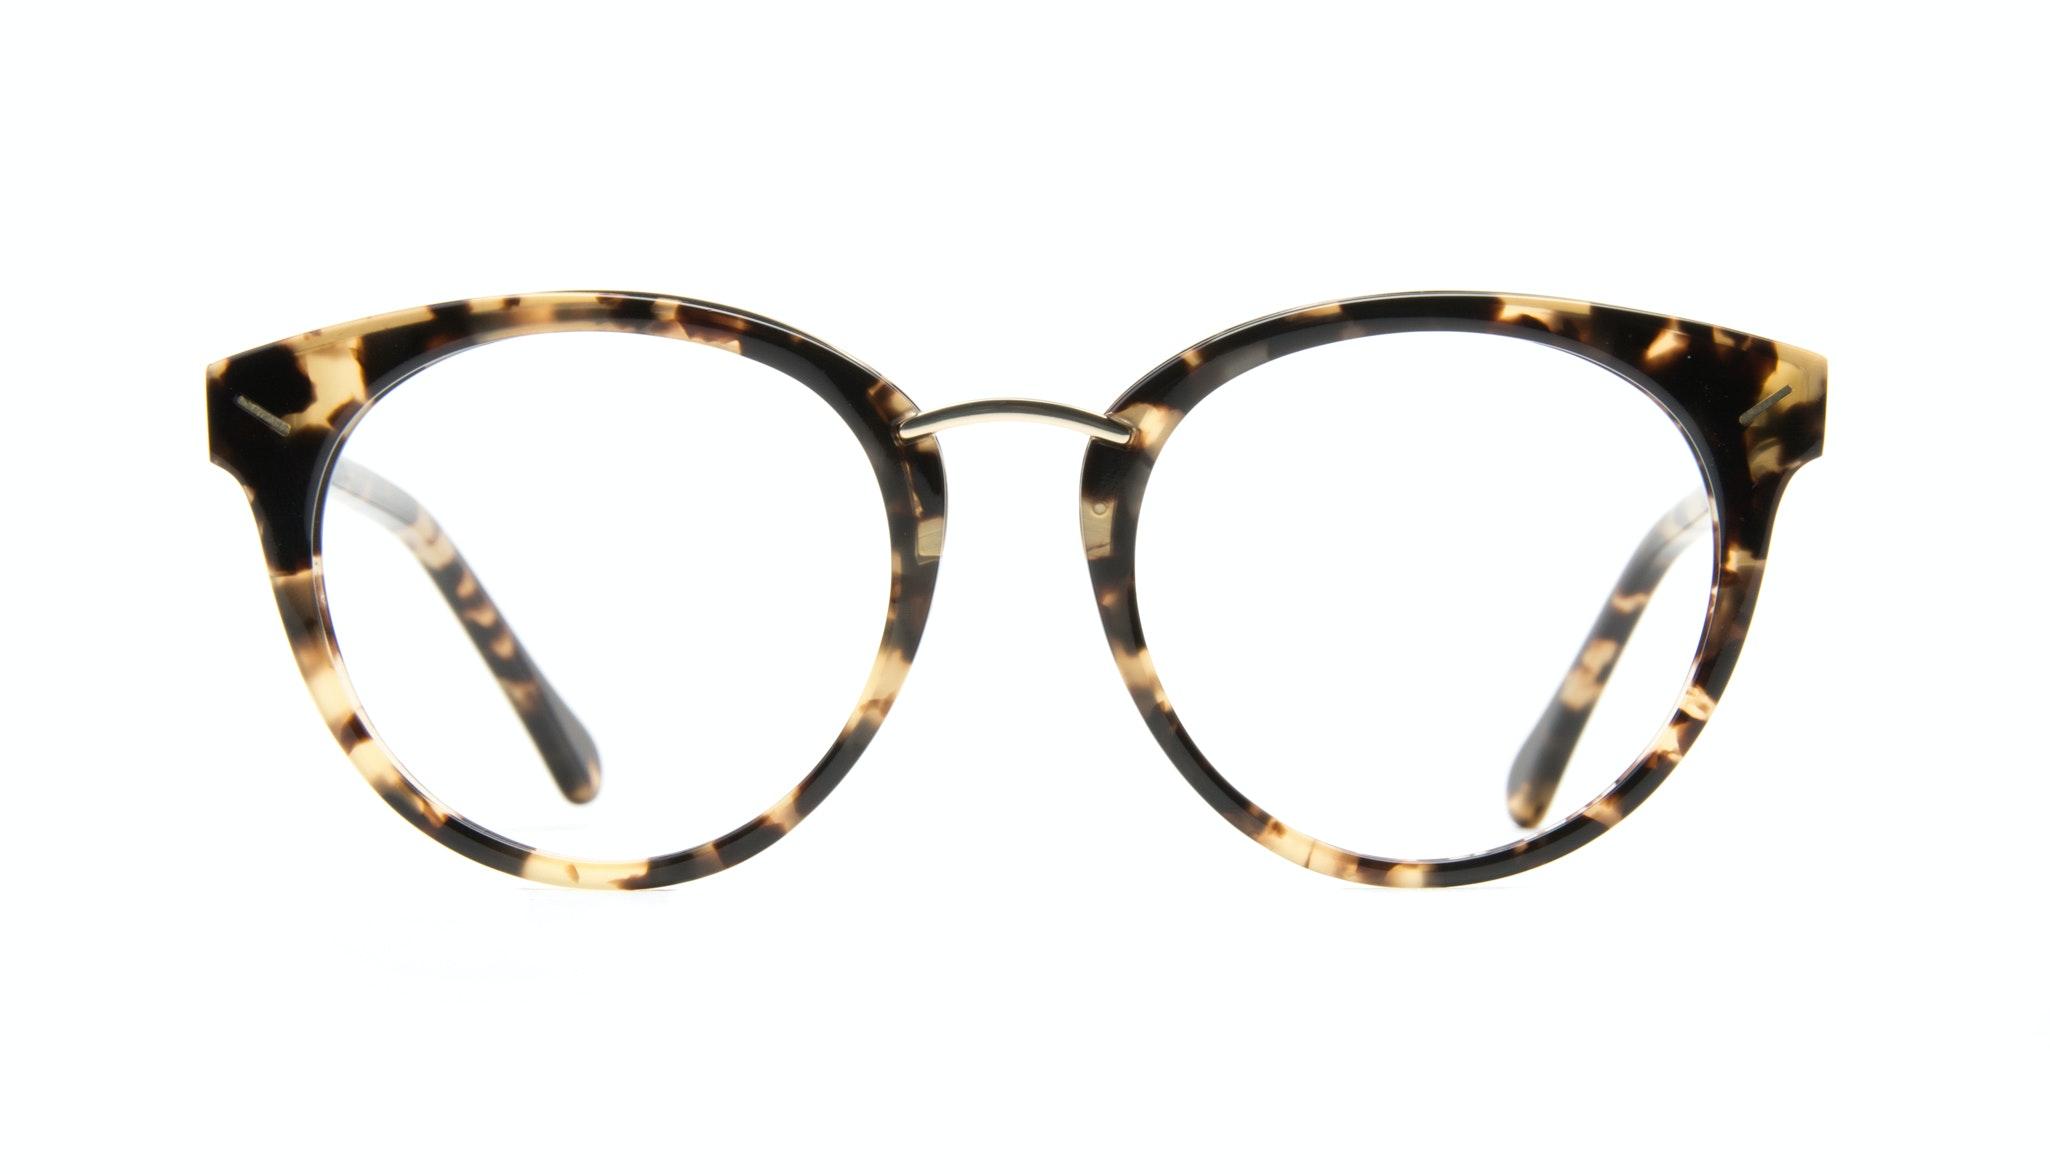 Affordable Fashion Glasses Round Eyeglasses Women Element Gold Tort Front